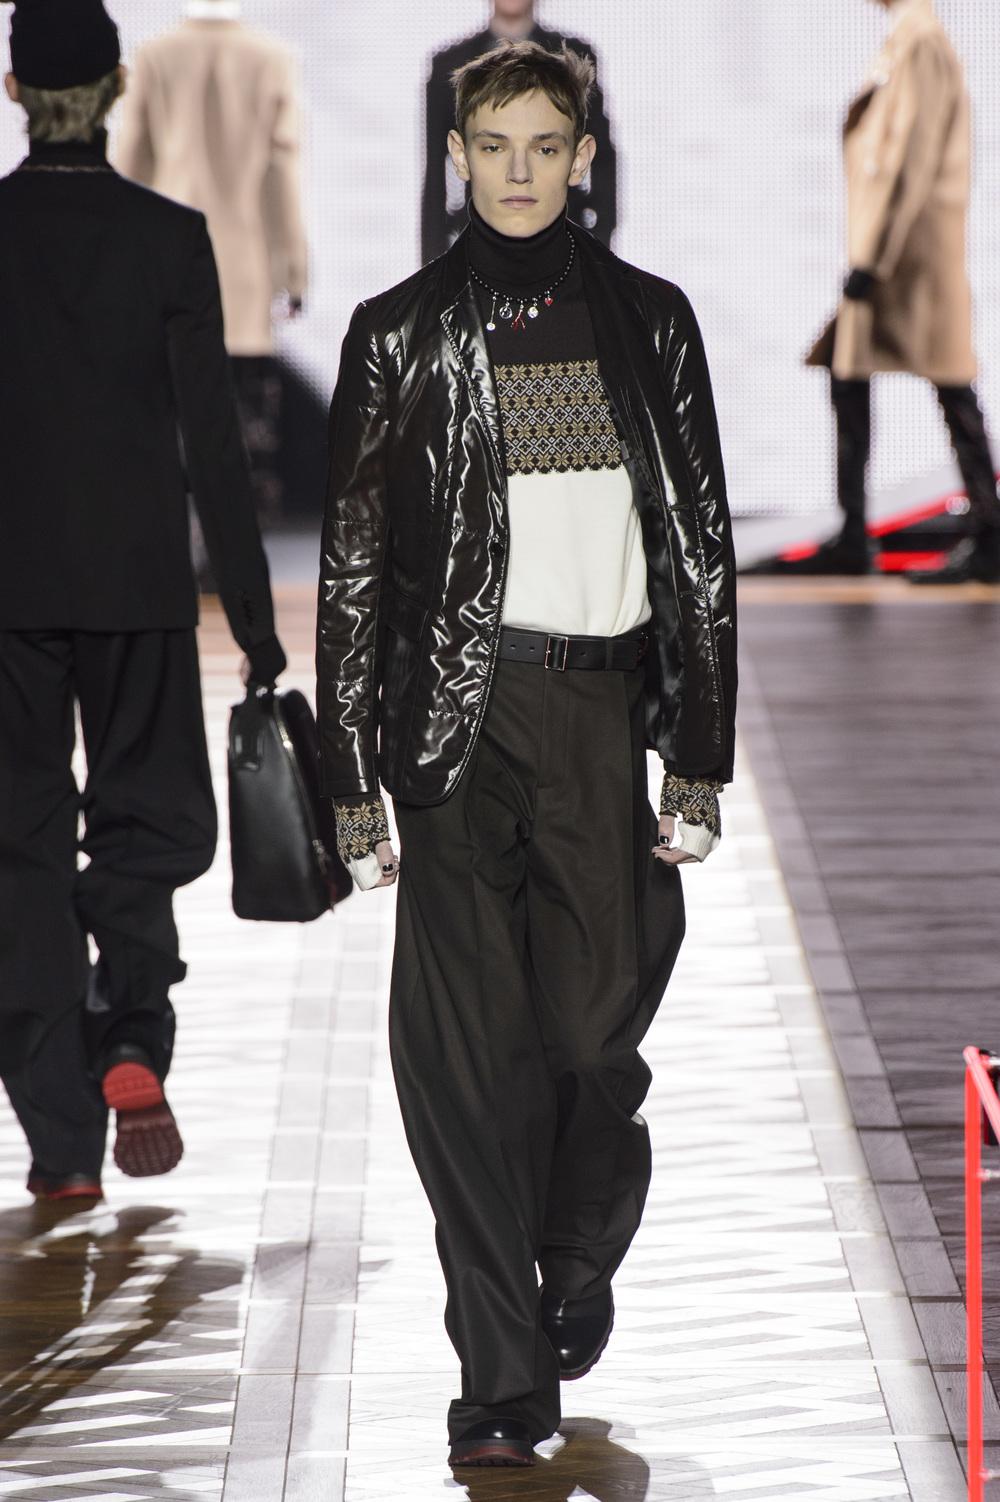 Dior_Homme_Hiver2016-17_look_33.JPG